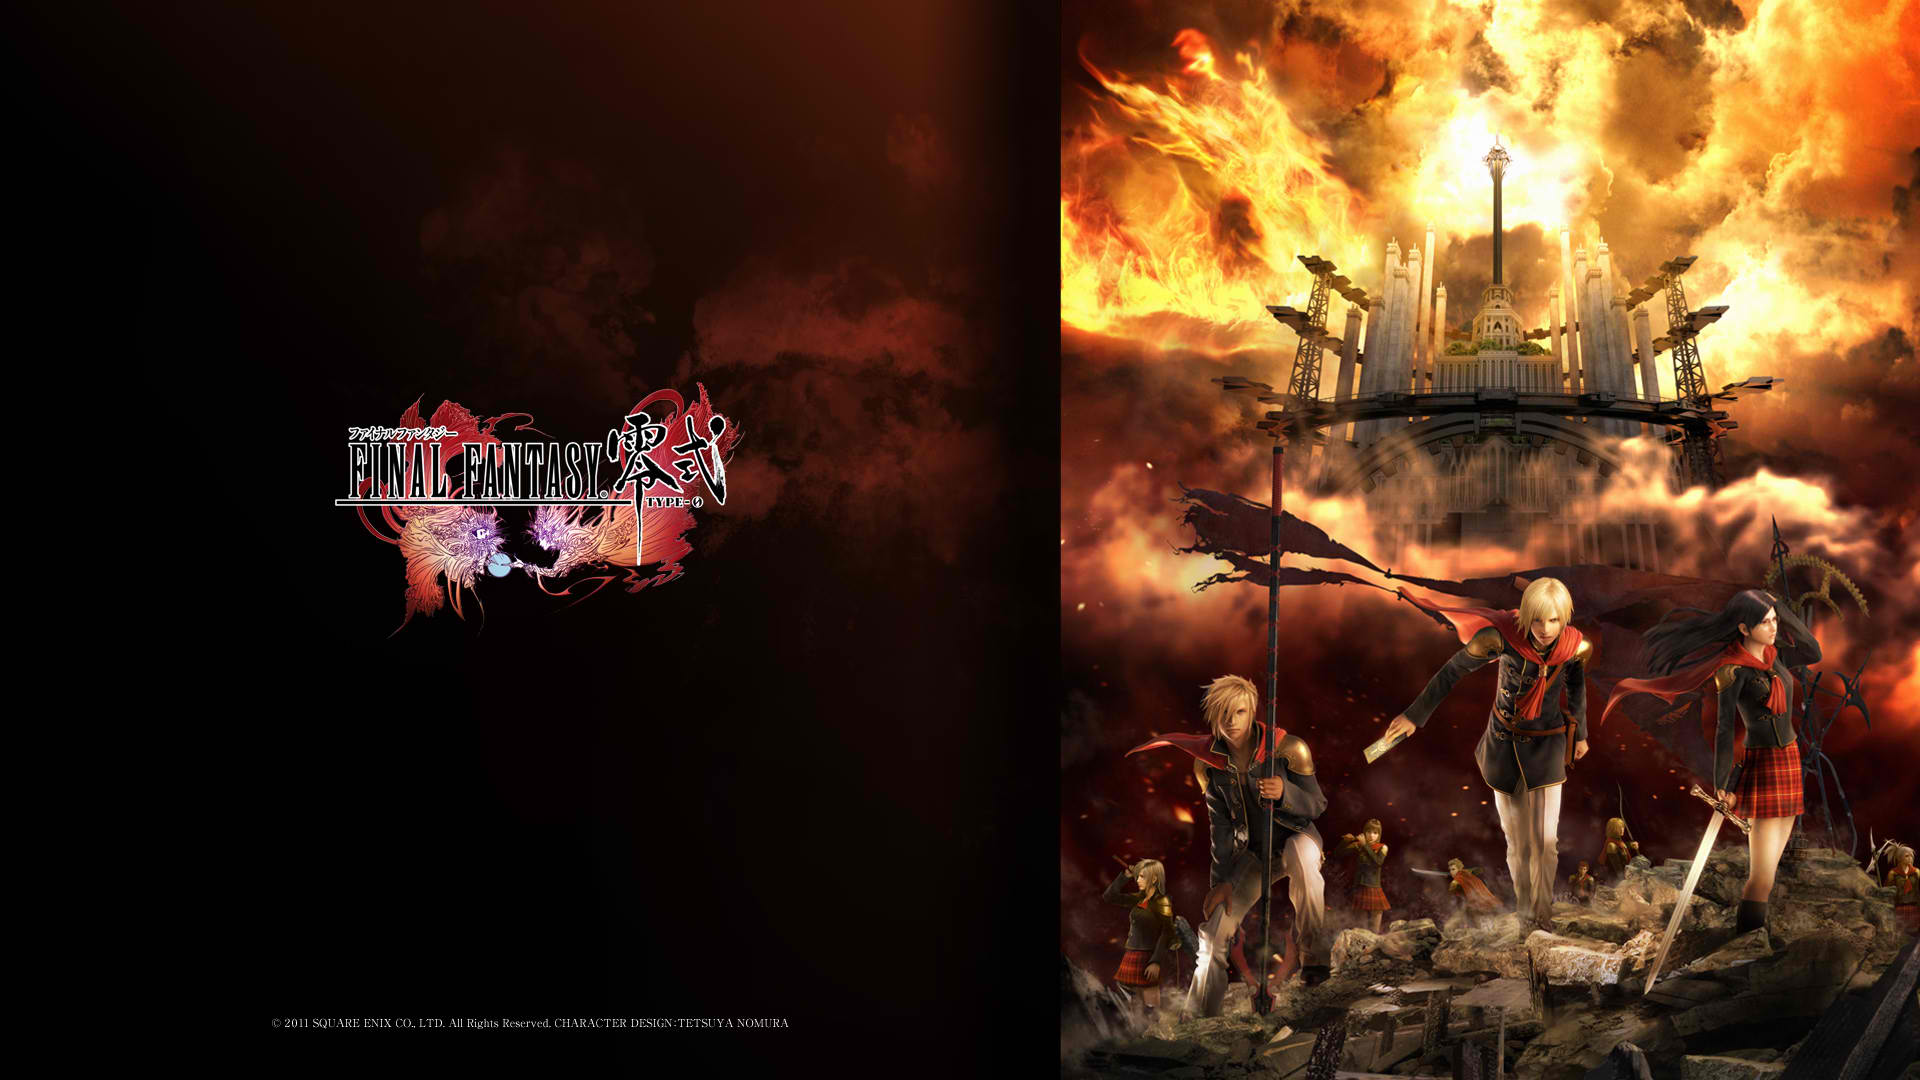 Final Fantasy Type 0 Hd Games 4k Wallpapers Images: Final Fantasy Type 0 Wallpaper